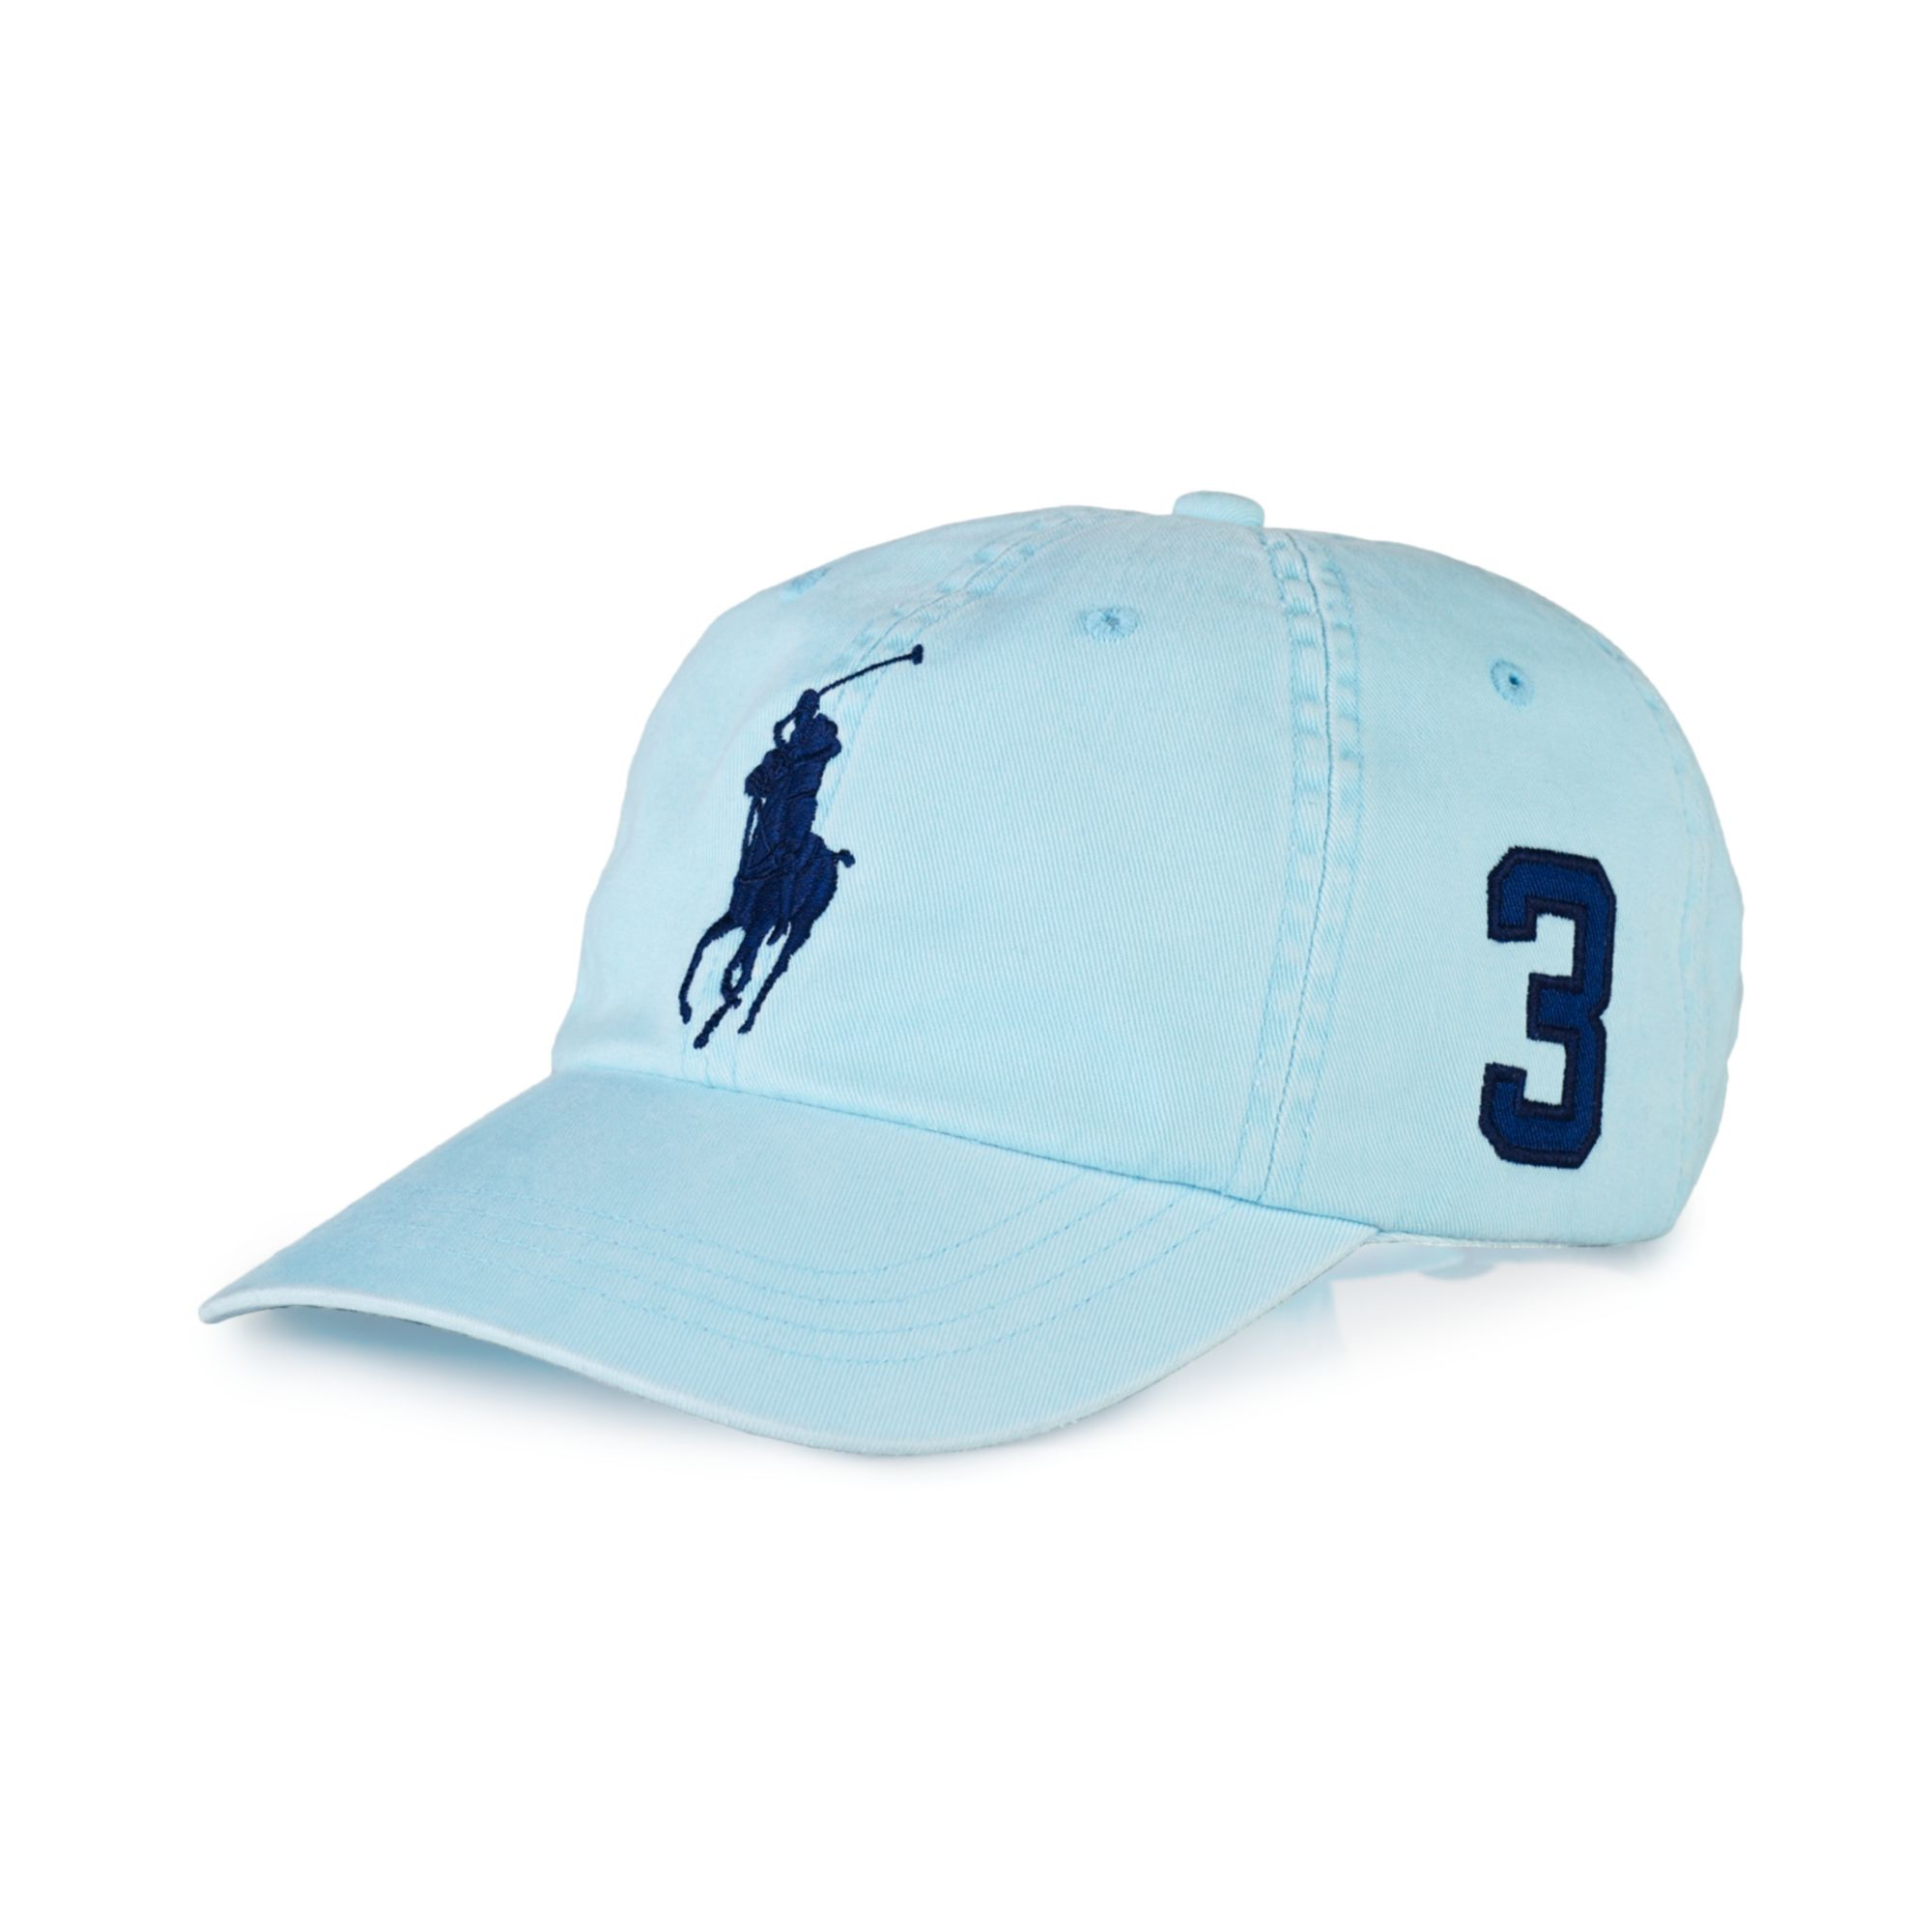 d3a02b6dda2 Lyst - Ralph Lauren Polo Classic Chino Sports Cap in Blue for Men